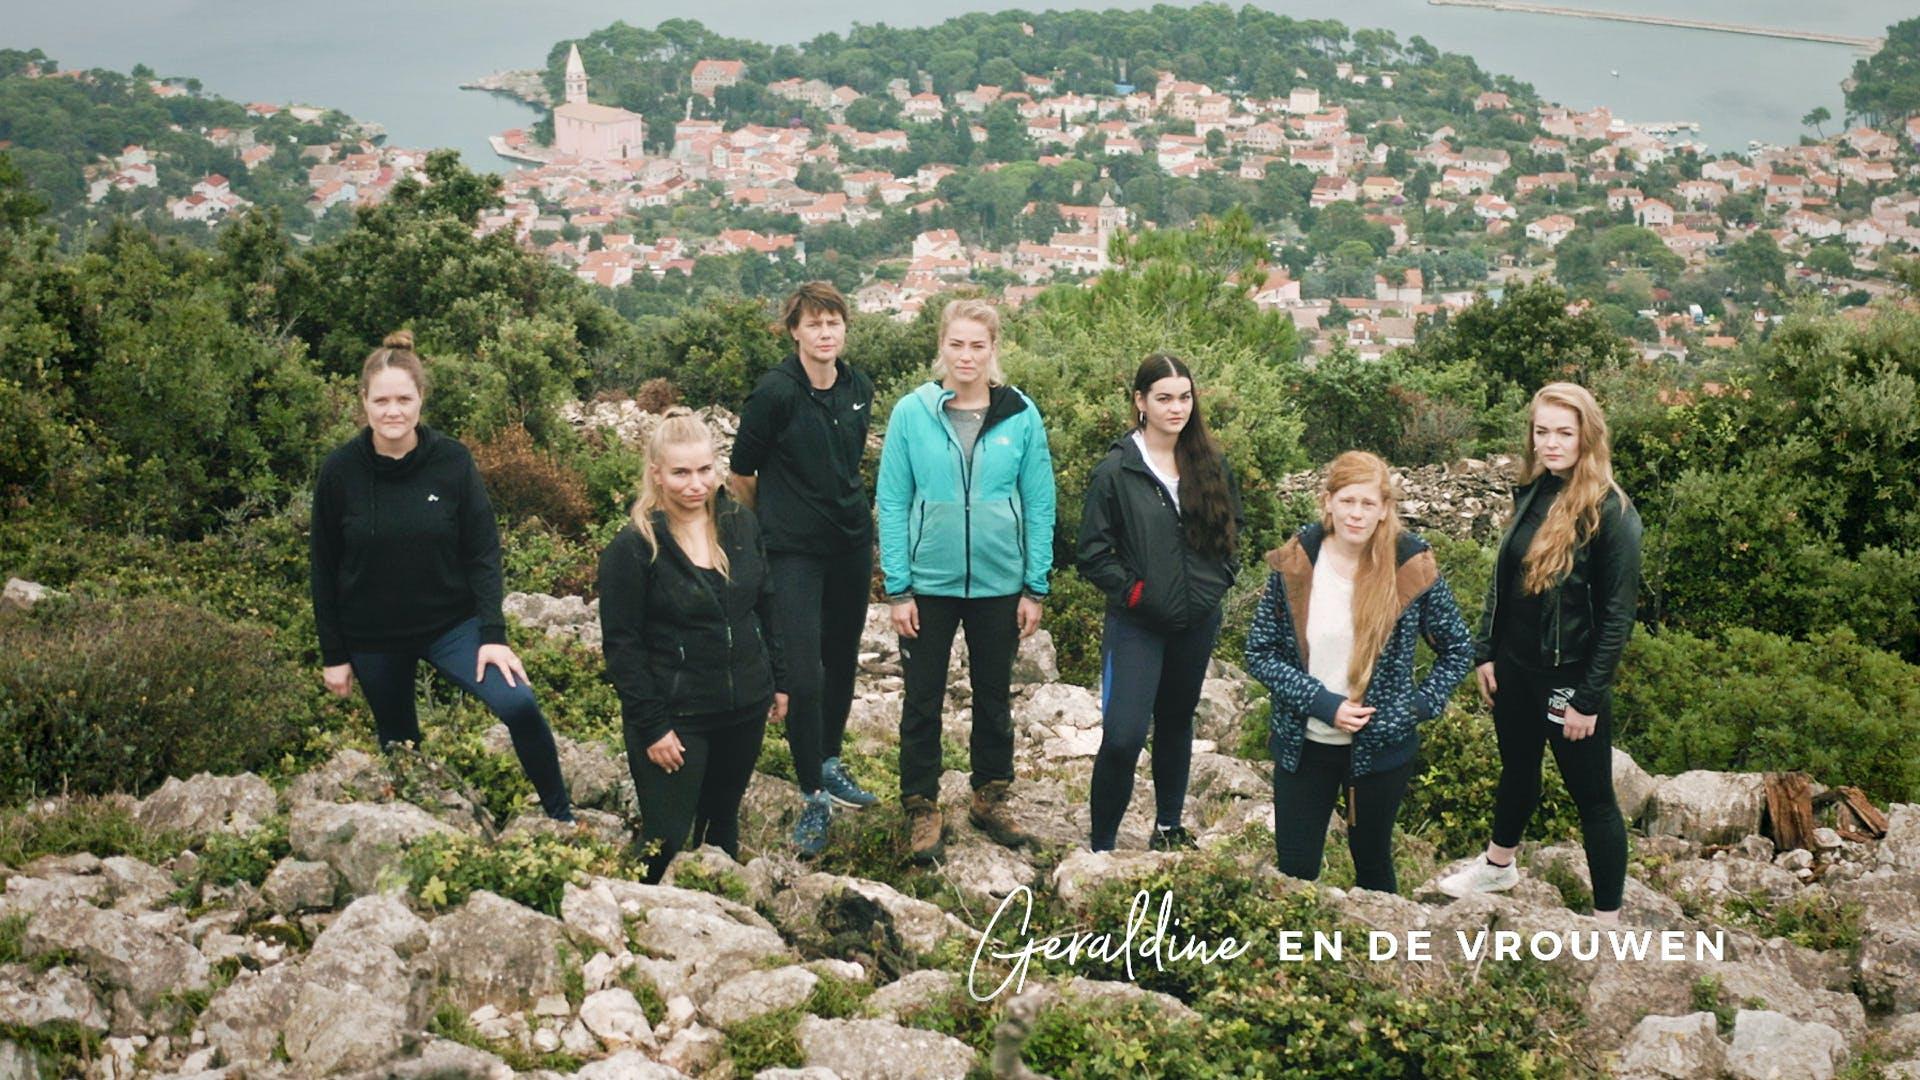 vlnr.: Jorien (36), Lynn (30), Marina (49), presentatrice Geraldine Kemper, Loïs (24), Hannah (28) en Anne (22)